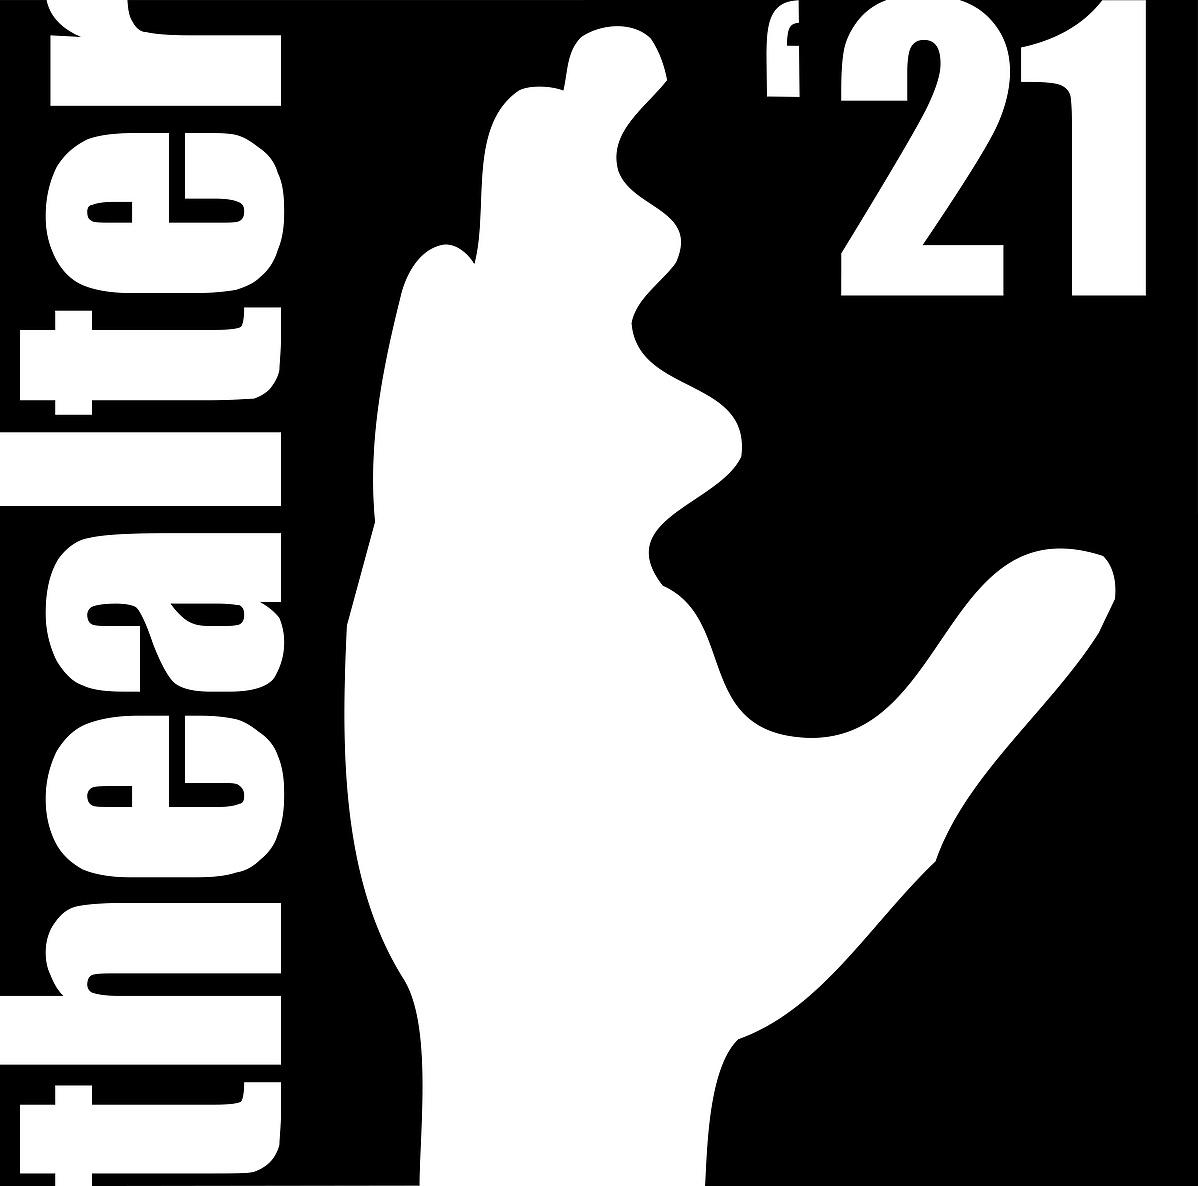 thealter_logok_20211-141940.jpg